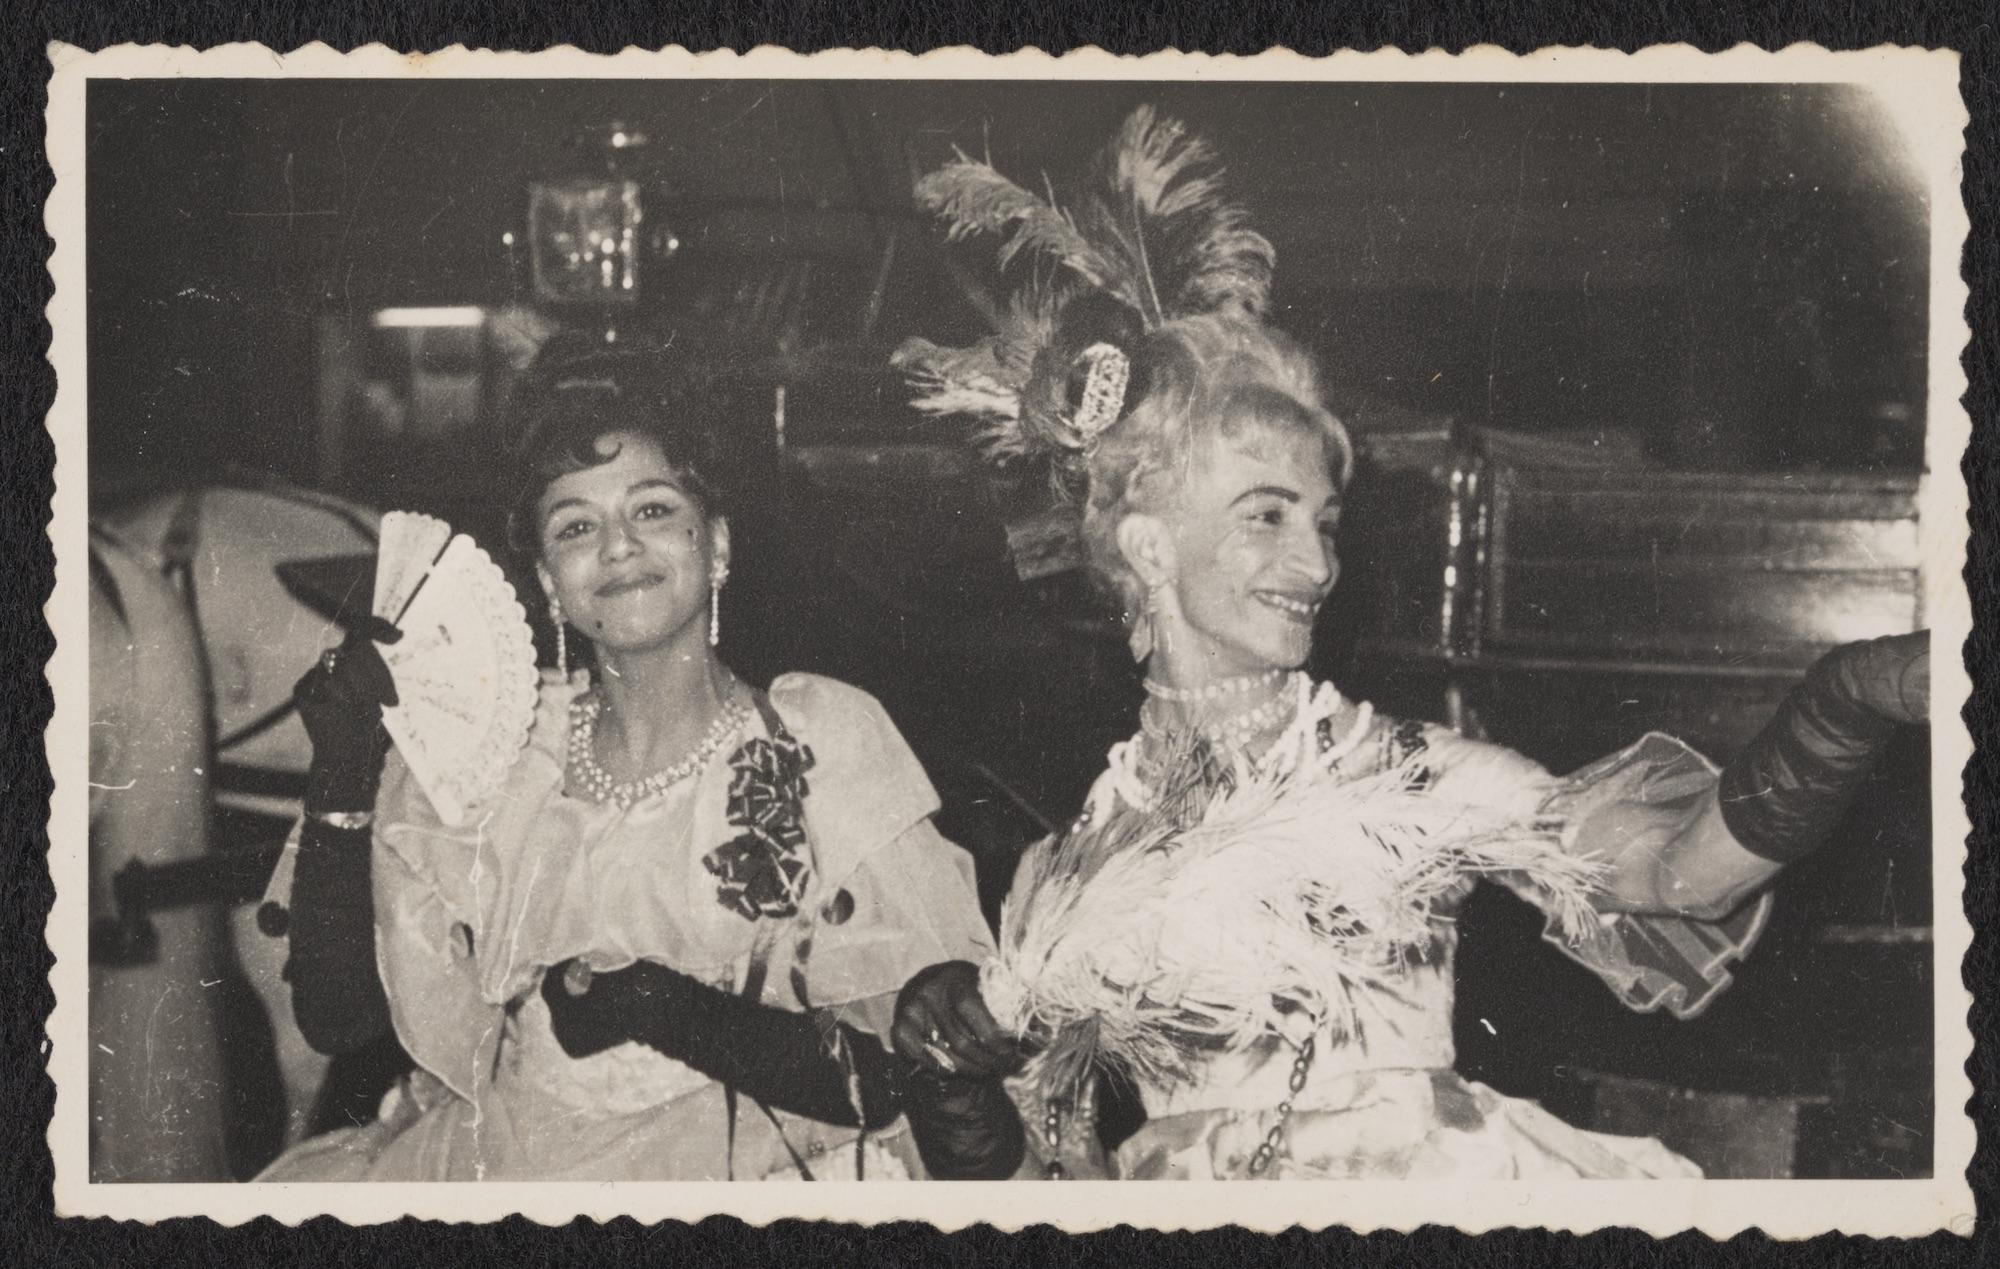 Sodia and Kewpie at the Marie Antoinette Ball at the Ambassador Club, circa 1950 to circa 1985